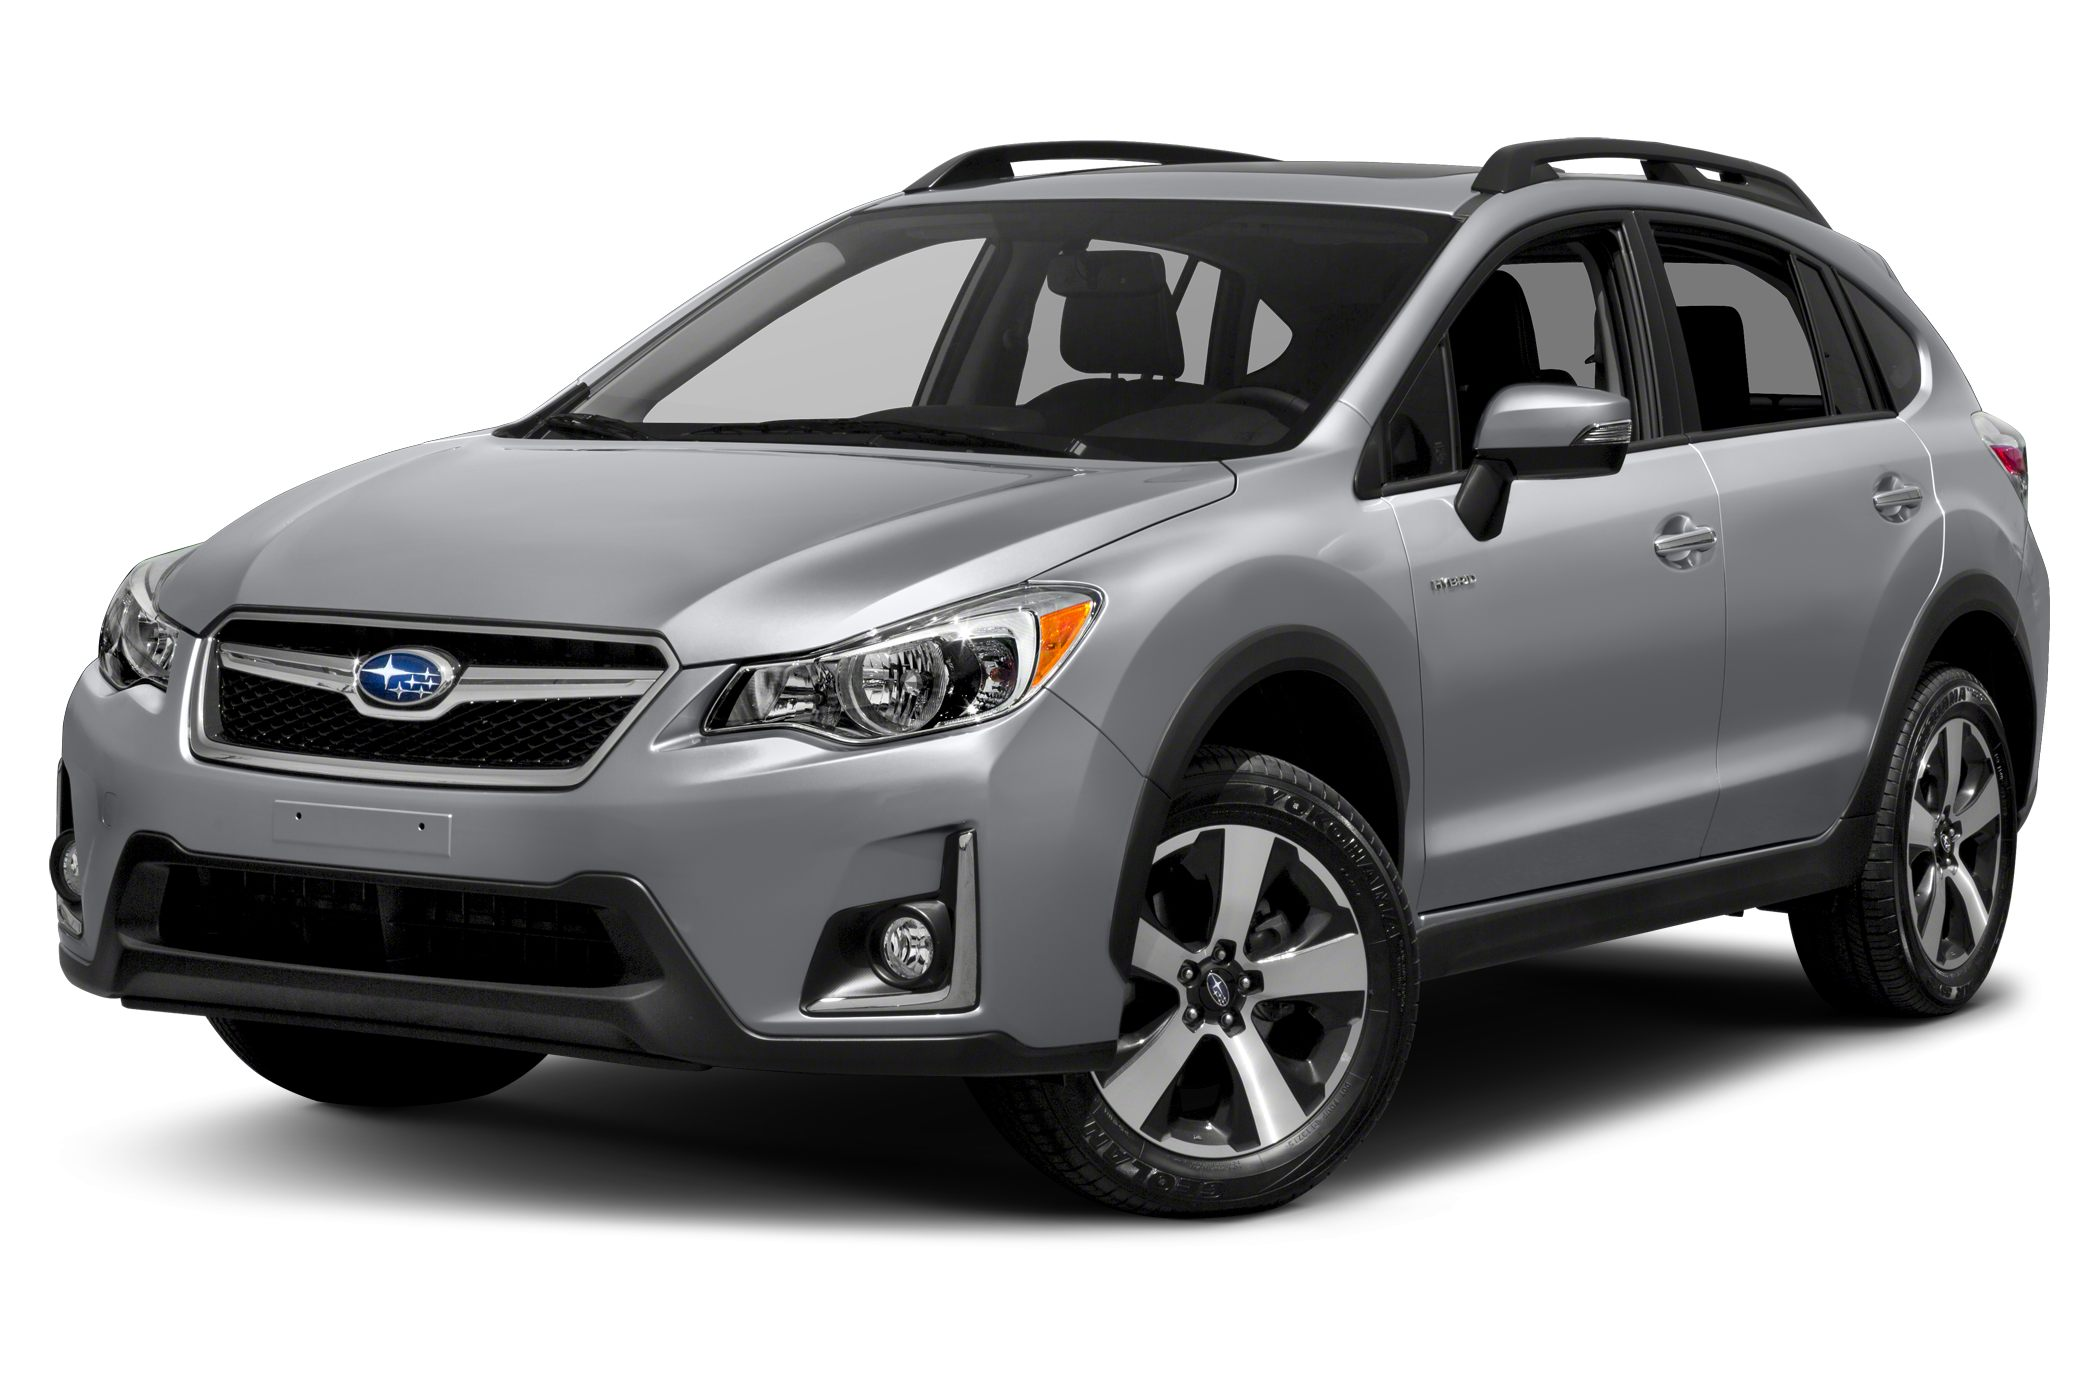 Subaru Crosstrek Hybrid Prices, Reviews and New Model ...